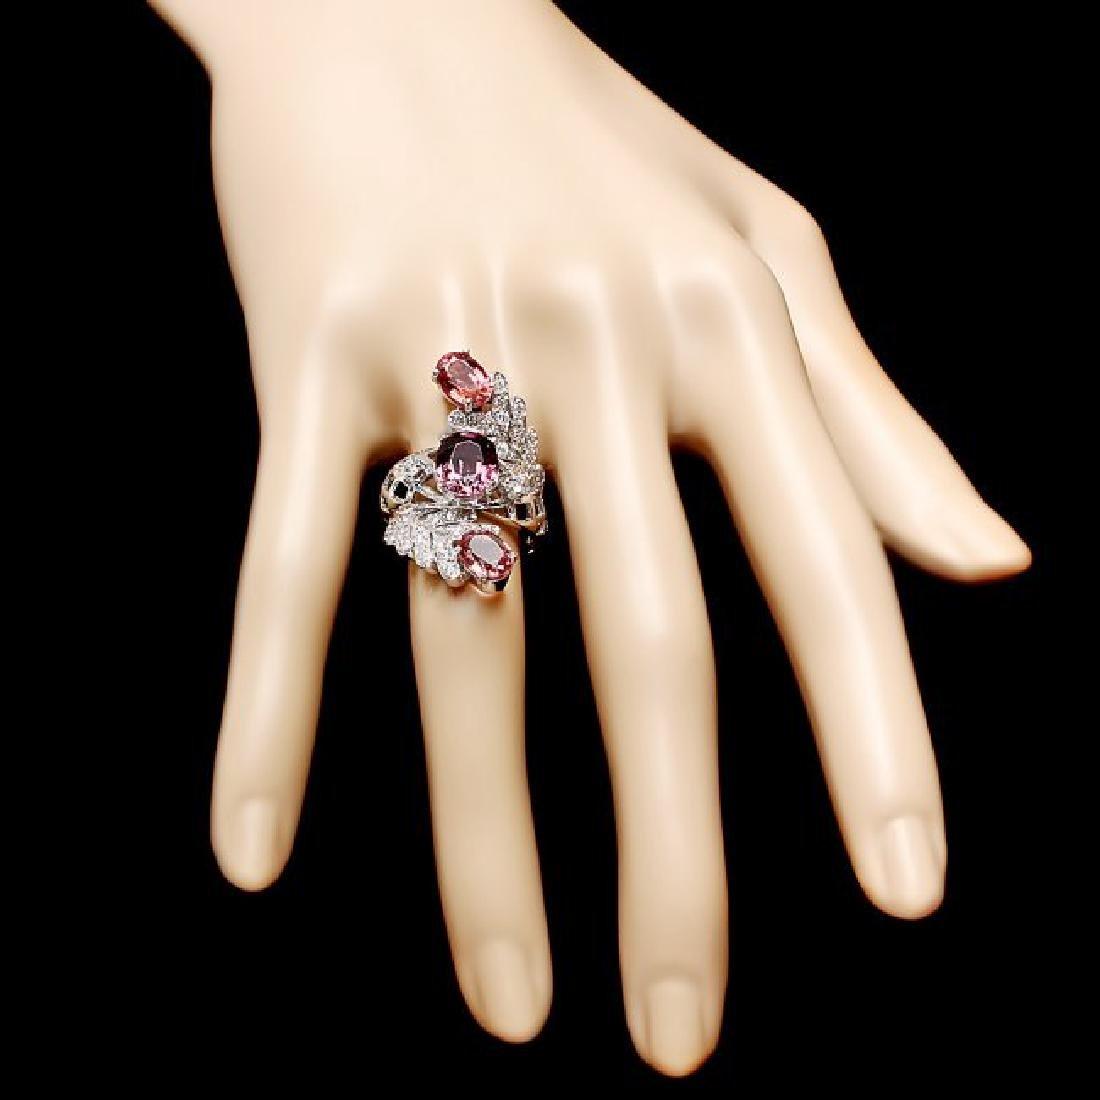 14k White Gold 5.5ct Spinel 1.00ct Diamond Ring - 4